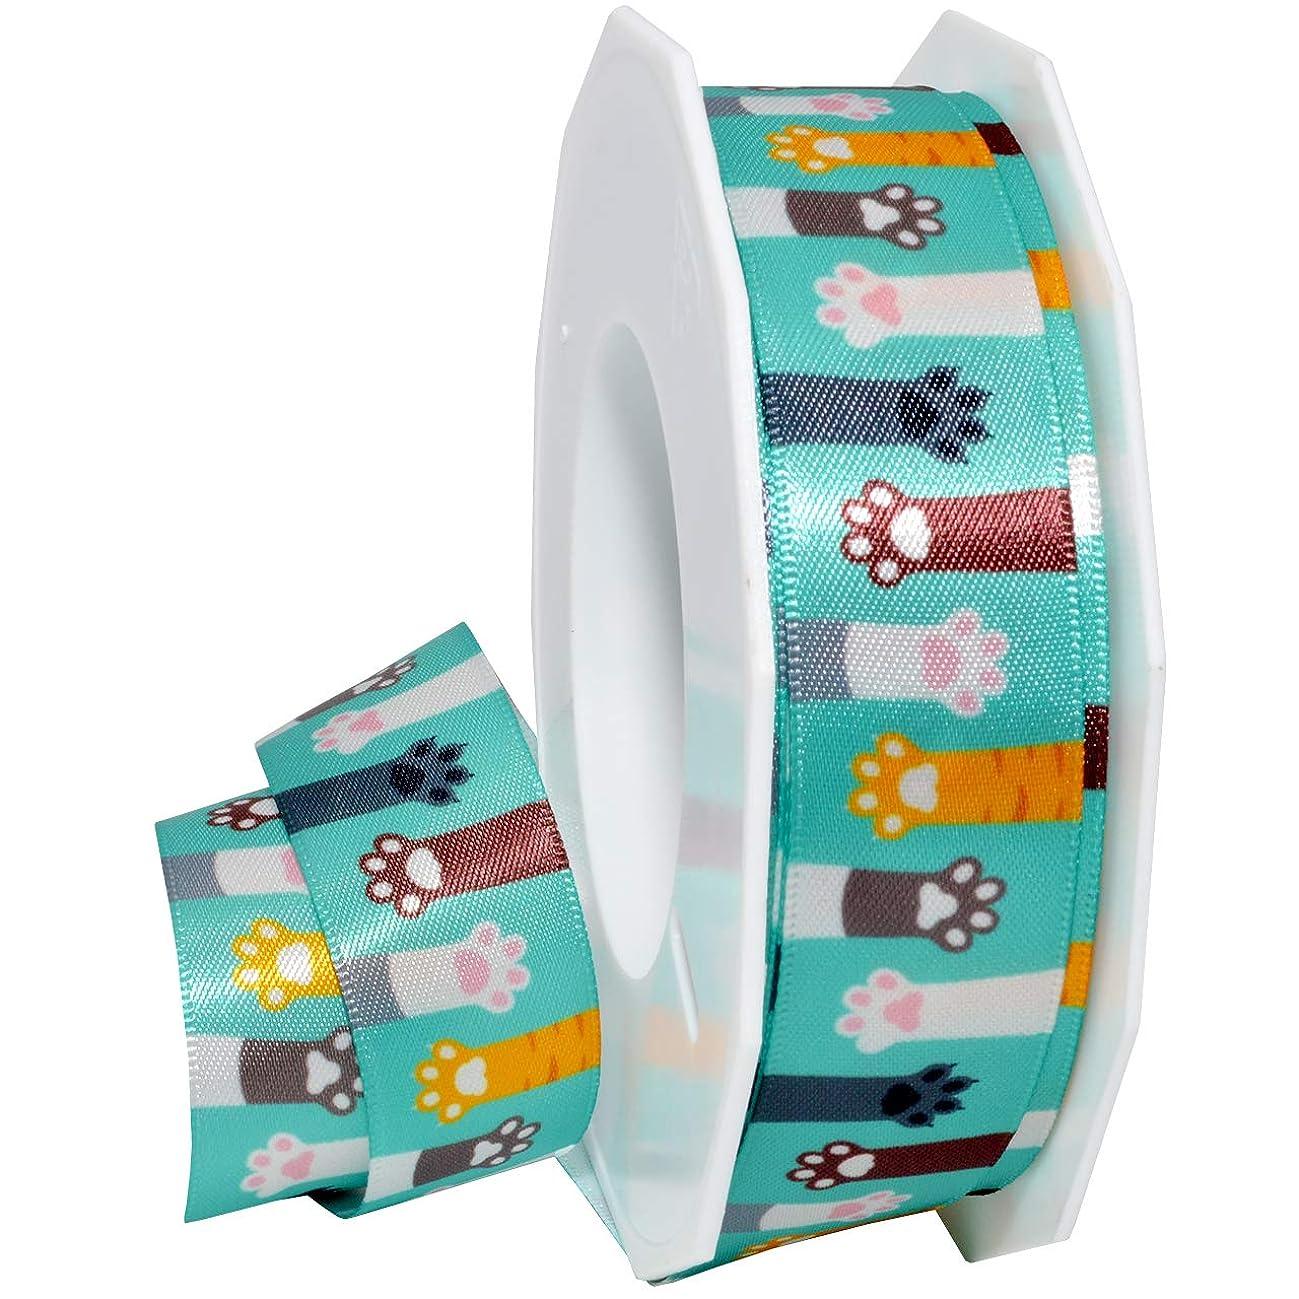 Morex Ribbon 5682 Precious Pets - Cat Paws Ribbon, 7/8 inch by 20 Yards, Aqua